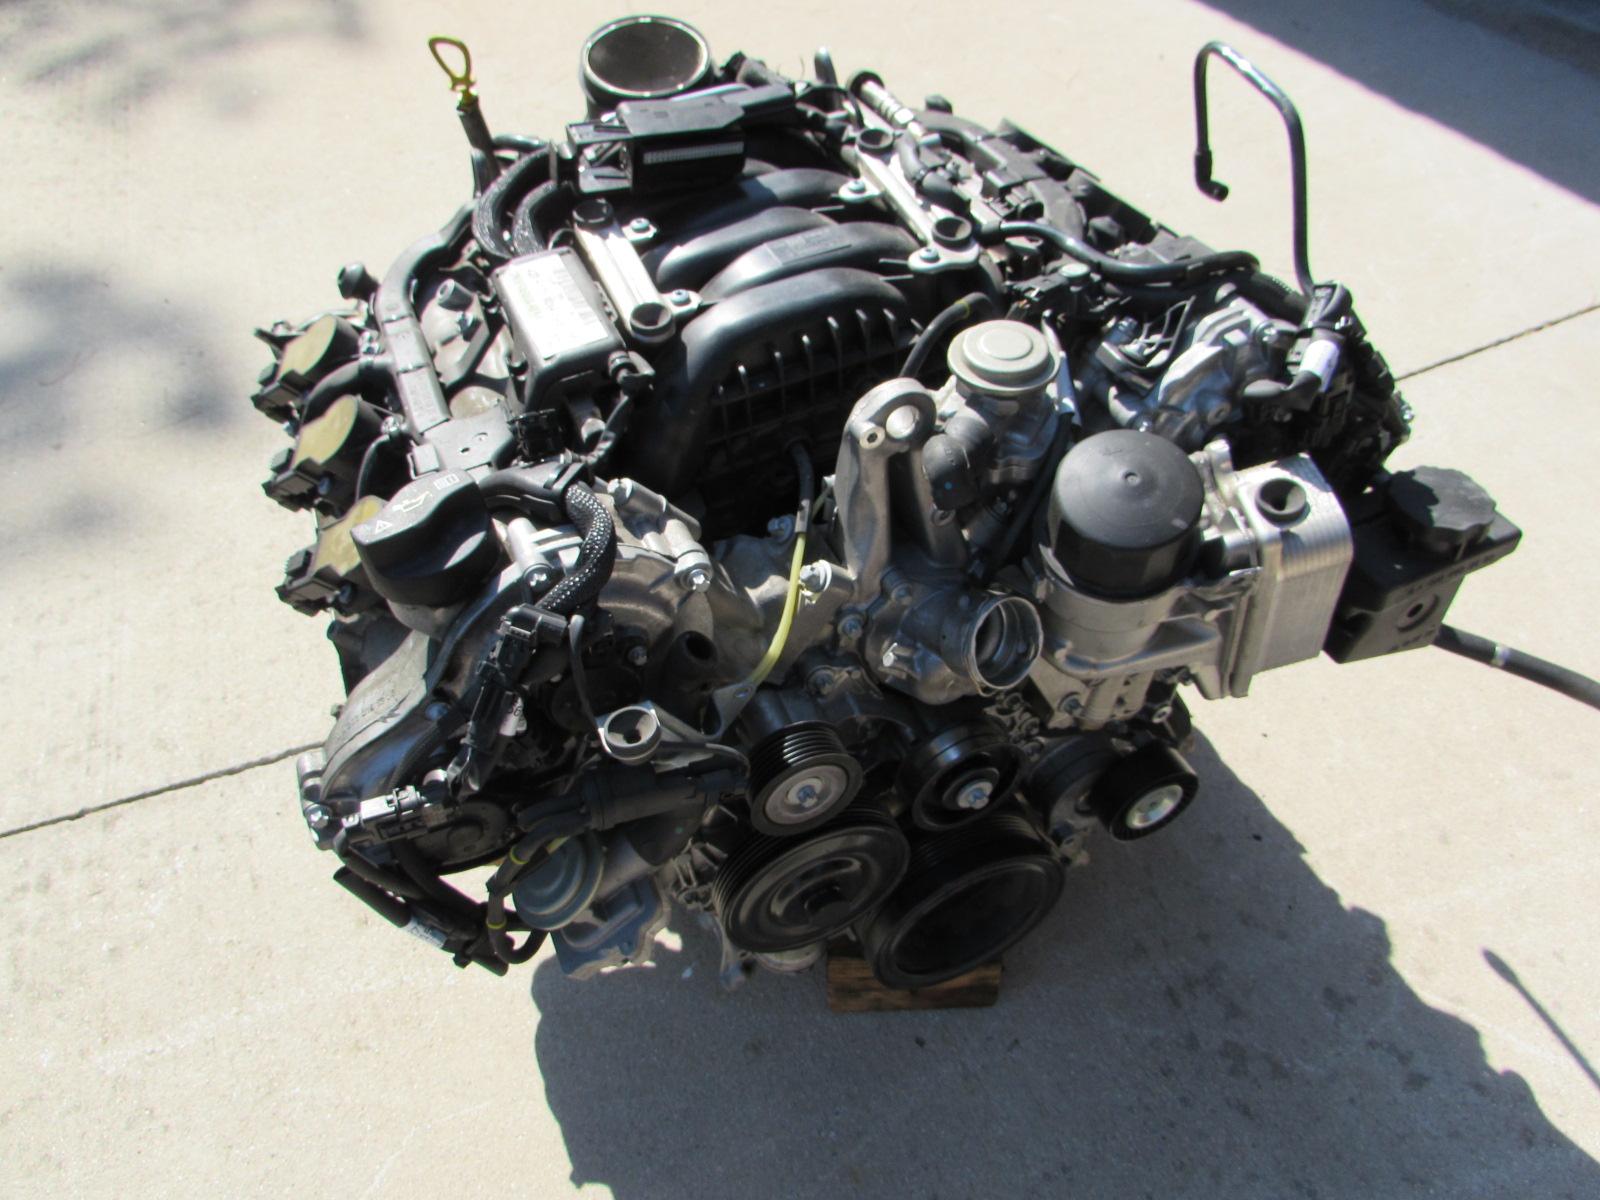 Mercedes Slk 350 Engine Schematics Wire Center 3 5l Diagram R171 Motor V6 M272 2009 2011 Slk350 Hermes Rh Hermesautoparts Com